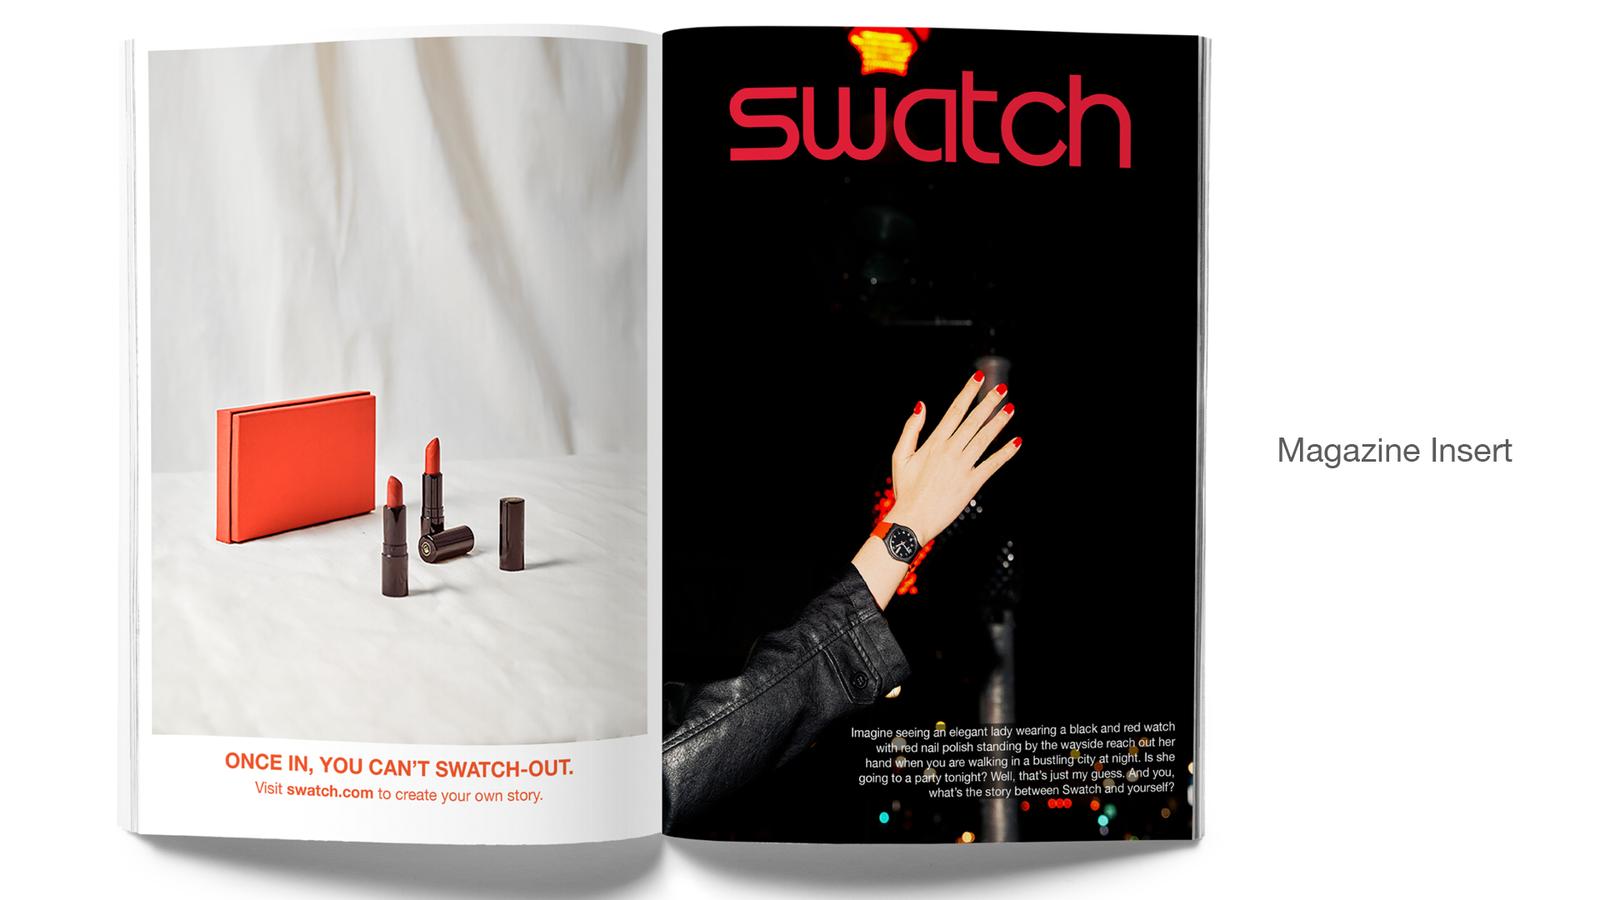 swatch4